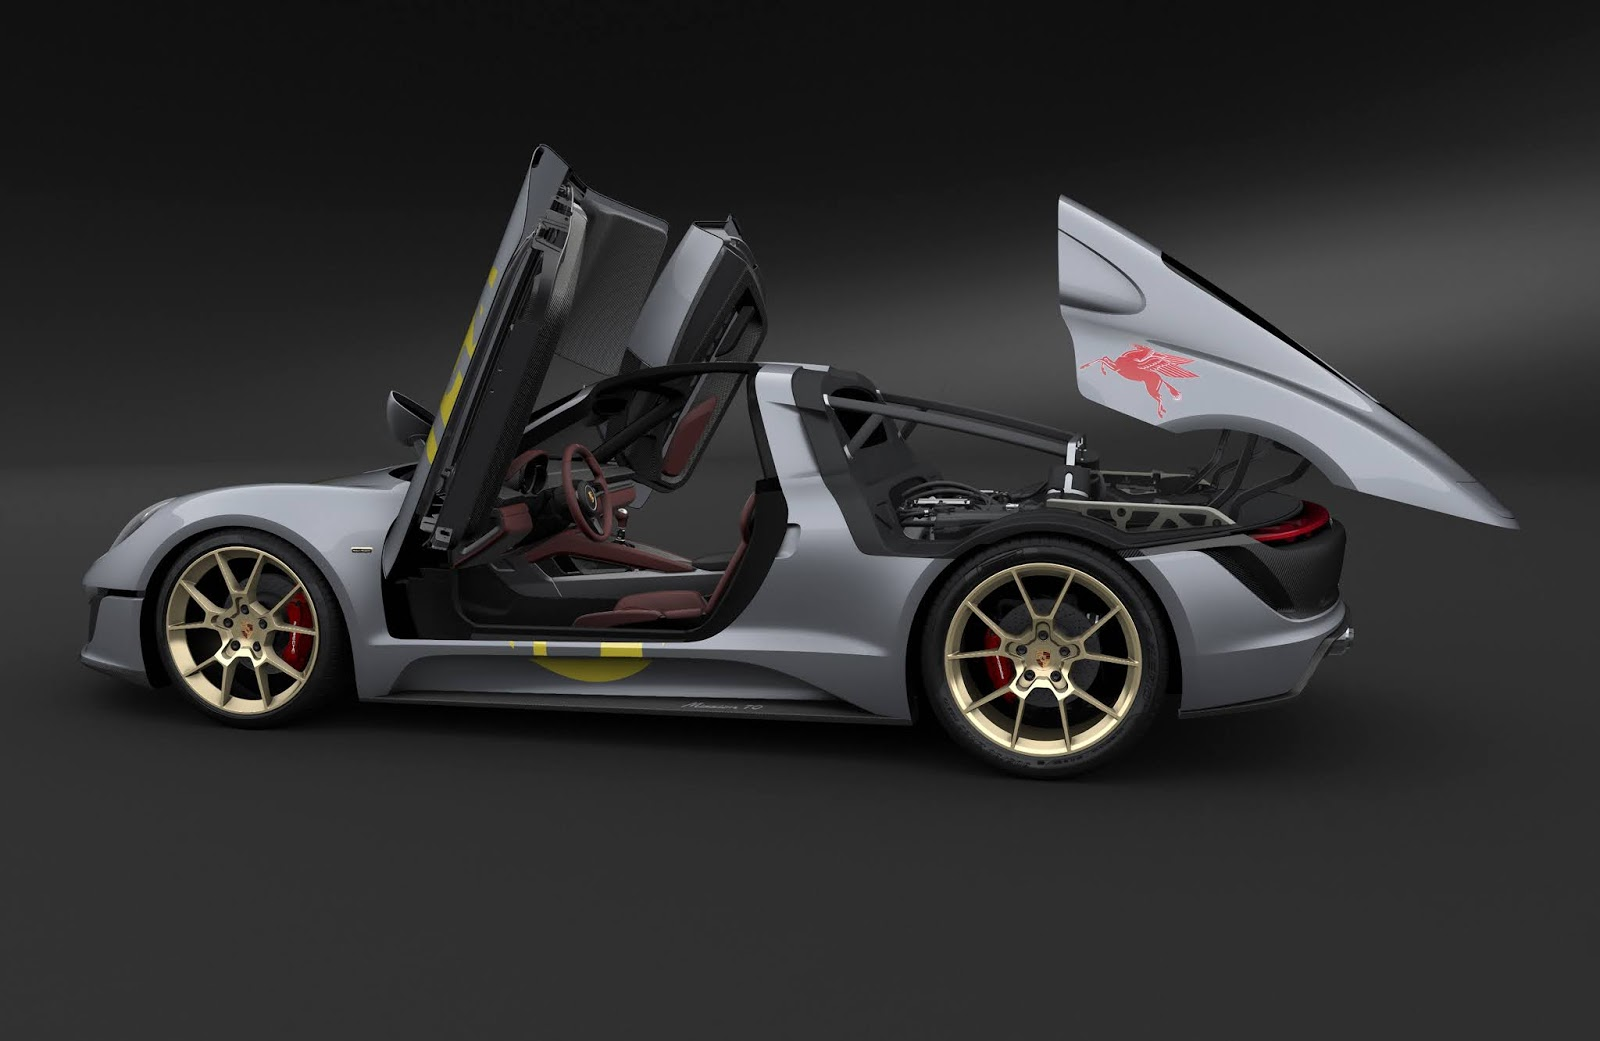 DGSnapshot LMC 160711 DG12.csb Camera 2016 07 13T16 57 02 hoeher Le Mans Living Legend : Το πρωτότυπο που γέννησε την 718 Cayman GT4 LE MANS, Porsche, Porsche Le Mans, Porsche Unseen, sportscar, supercar, supercars, zblog, ειδήσεις